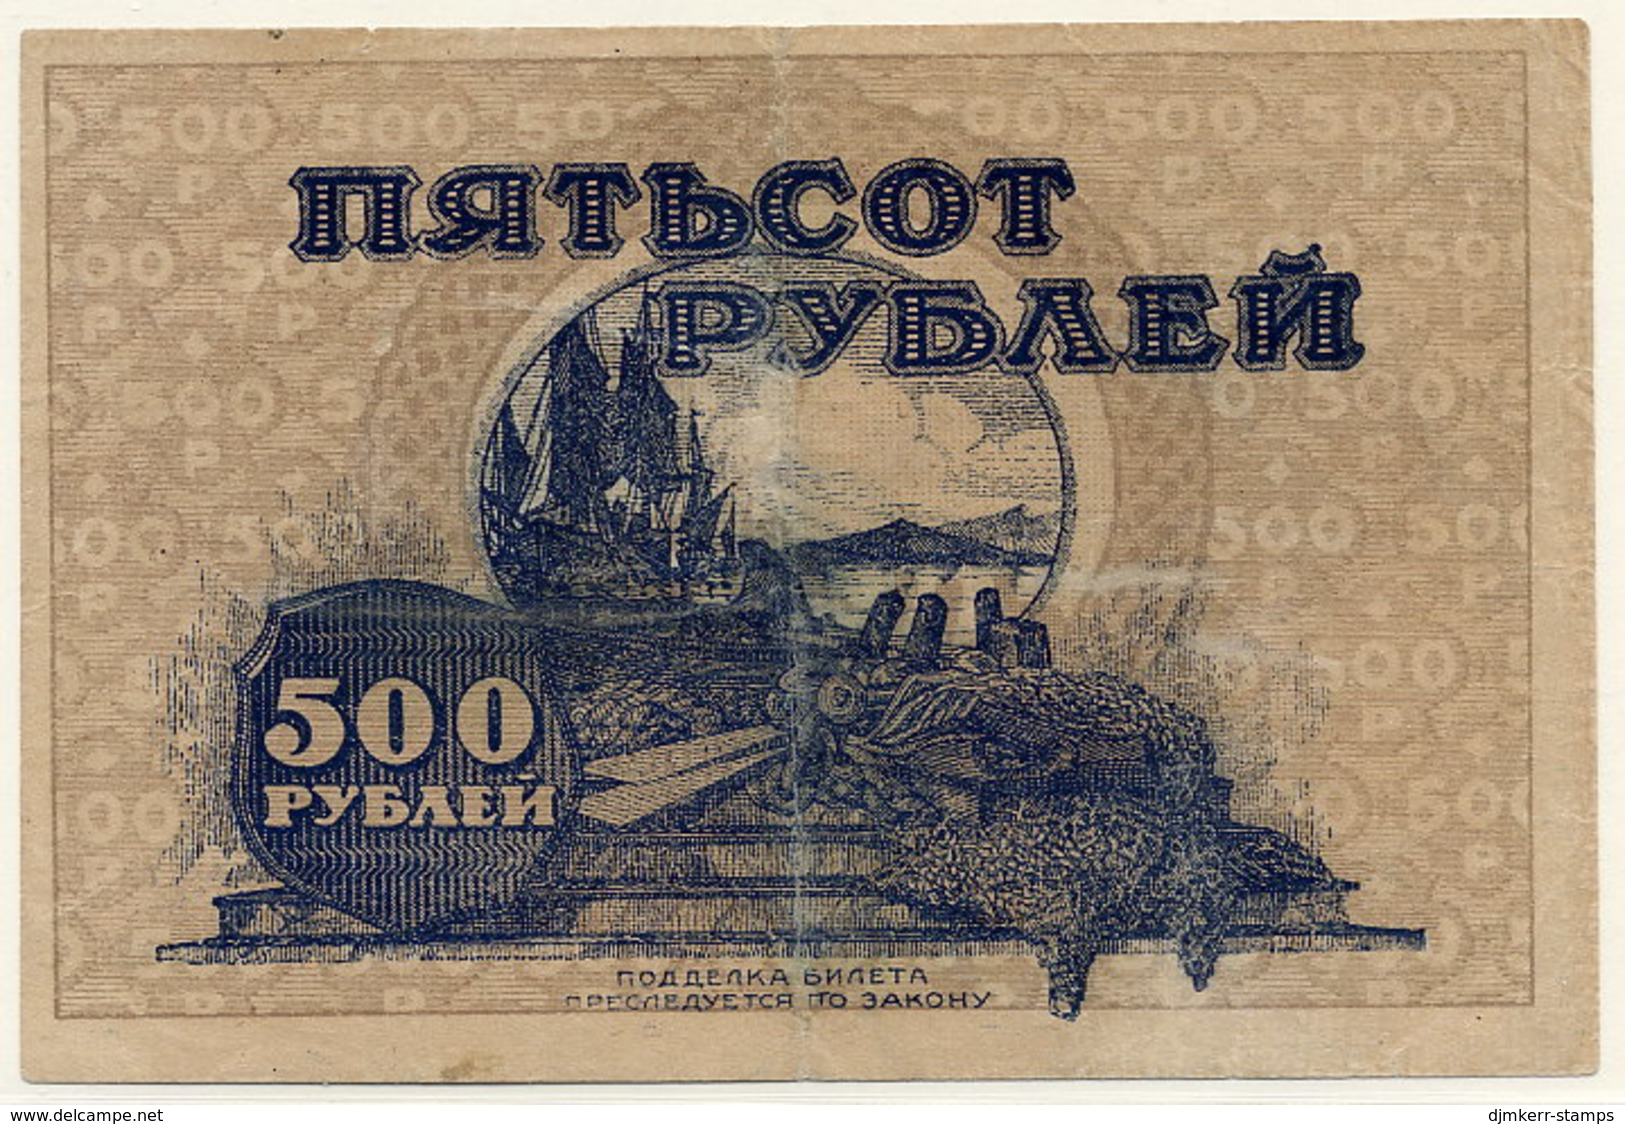 EAST SIBERIA (Far Eastern Republic) 1920 500 Rub.  VF S1207 - Russia